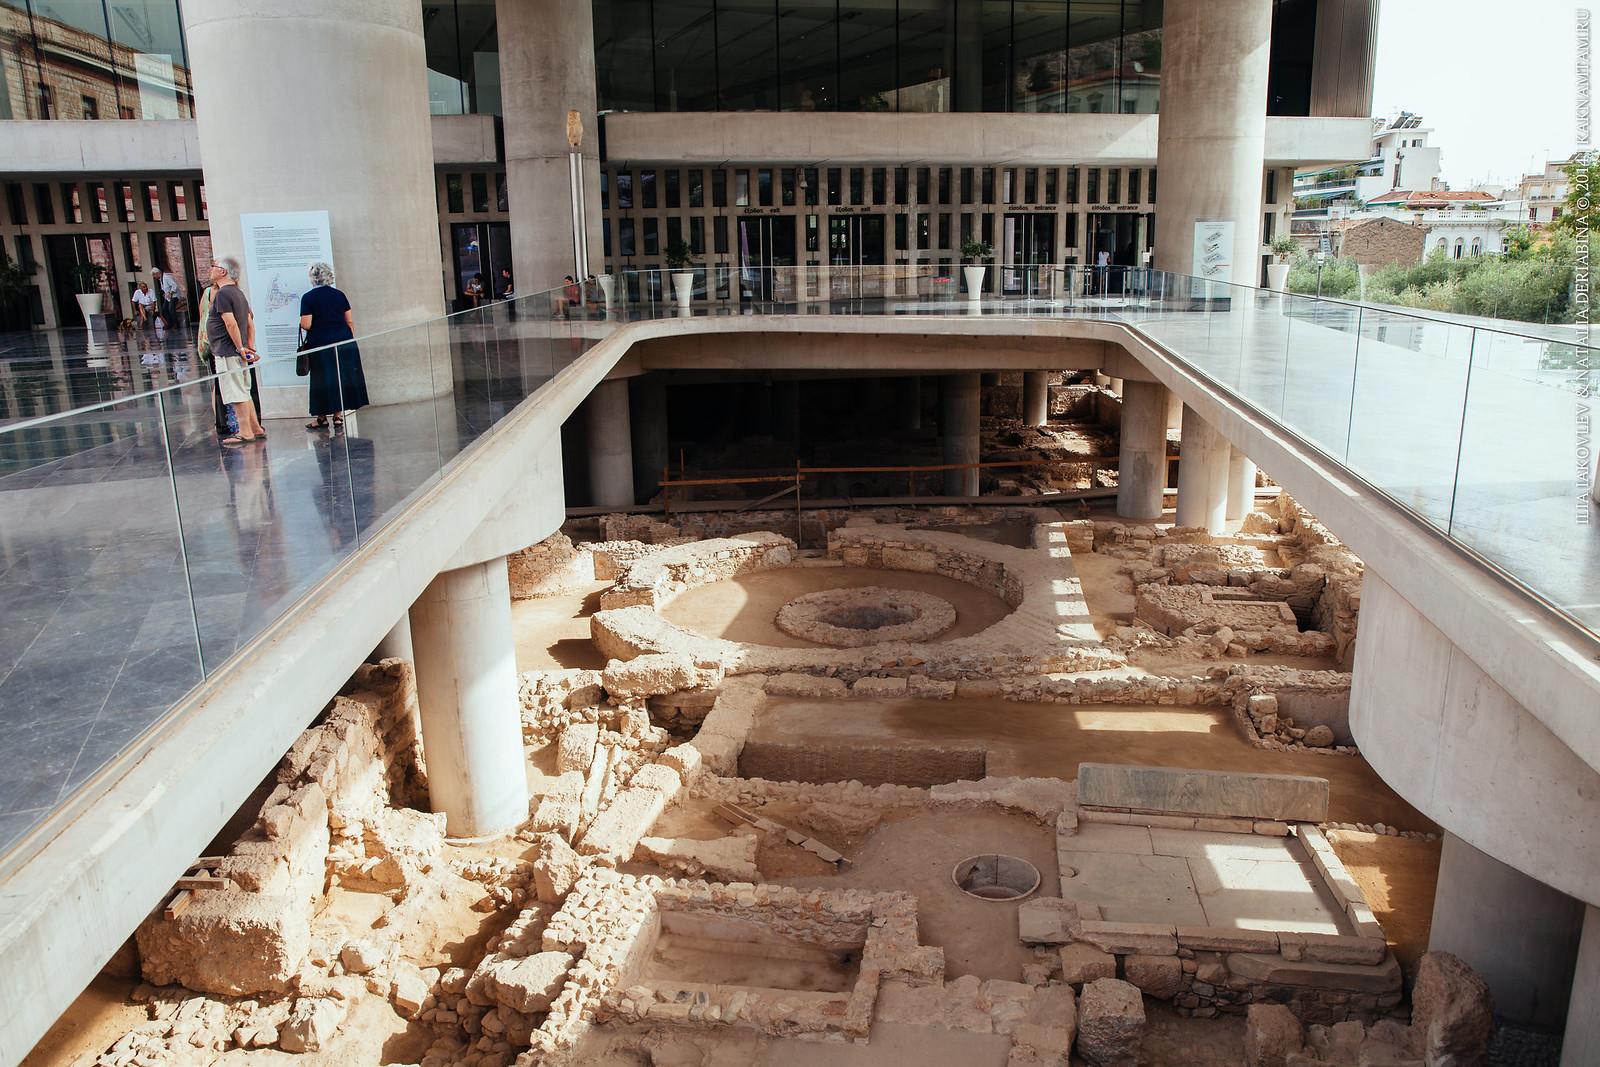 20140618-018-Athens.jpg